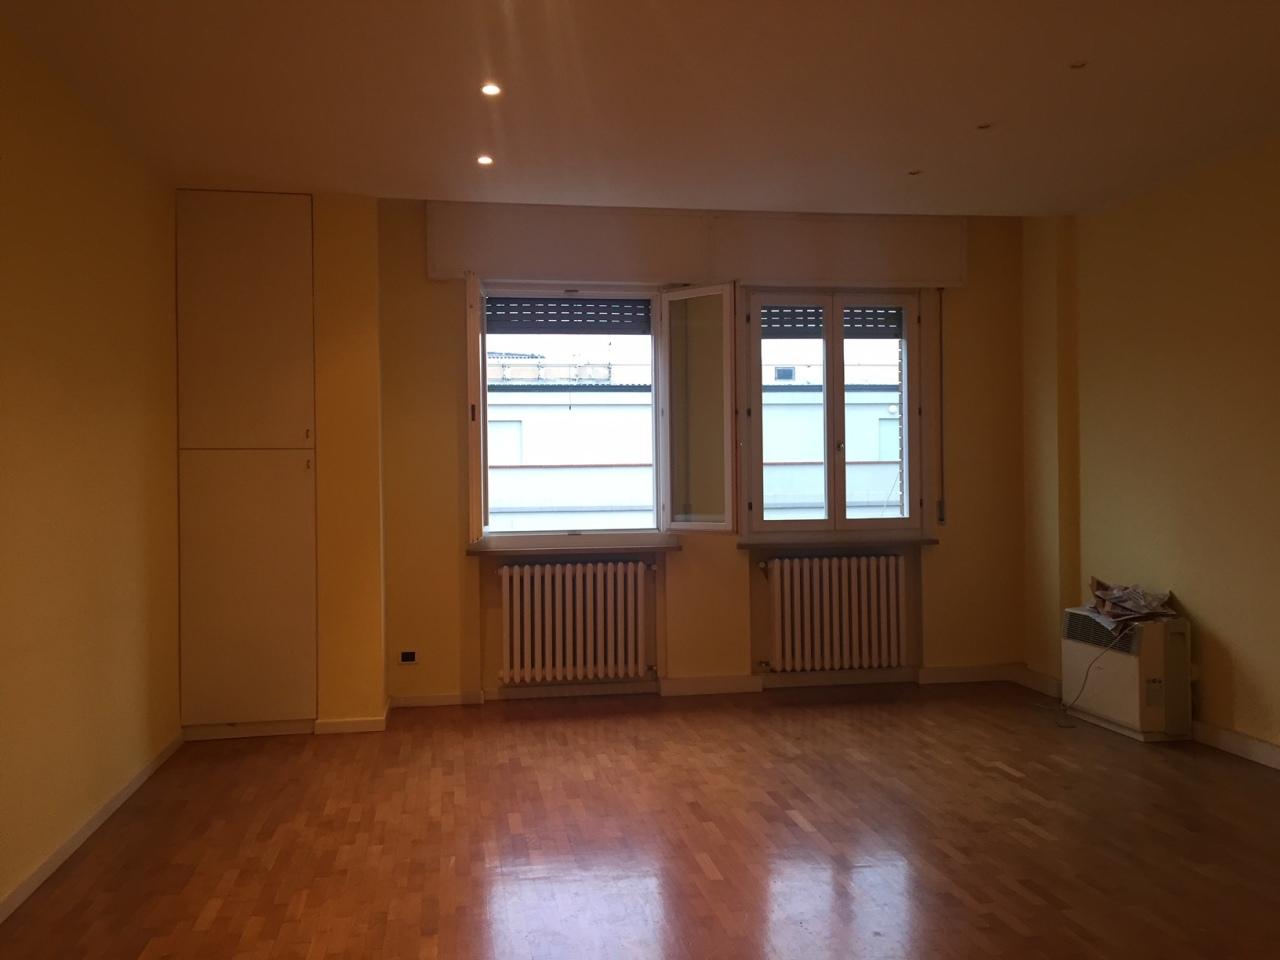 Appartamento, 90 Mq, Vendita - Rovigo